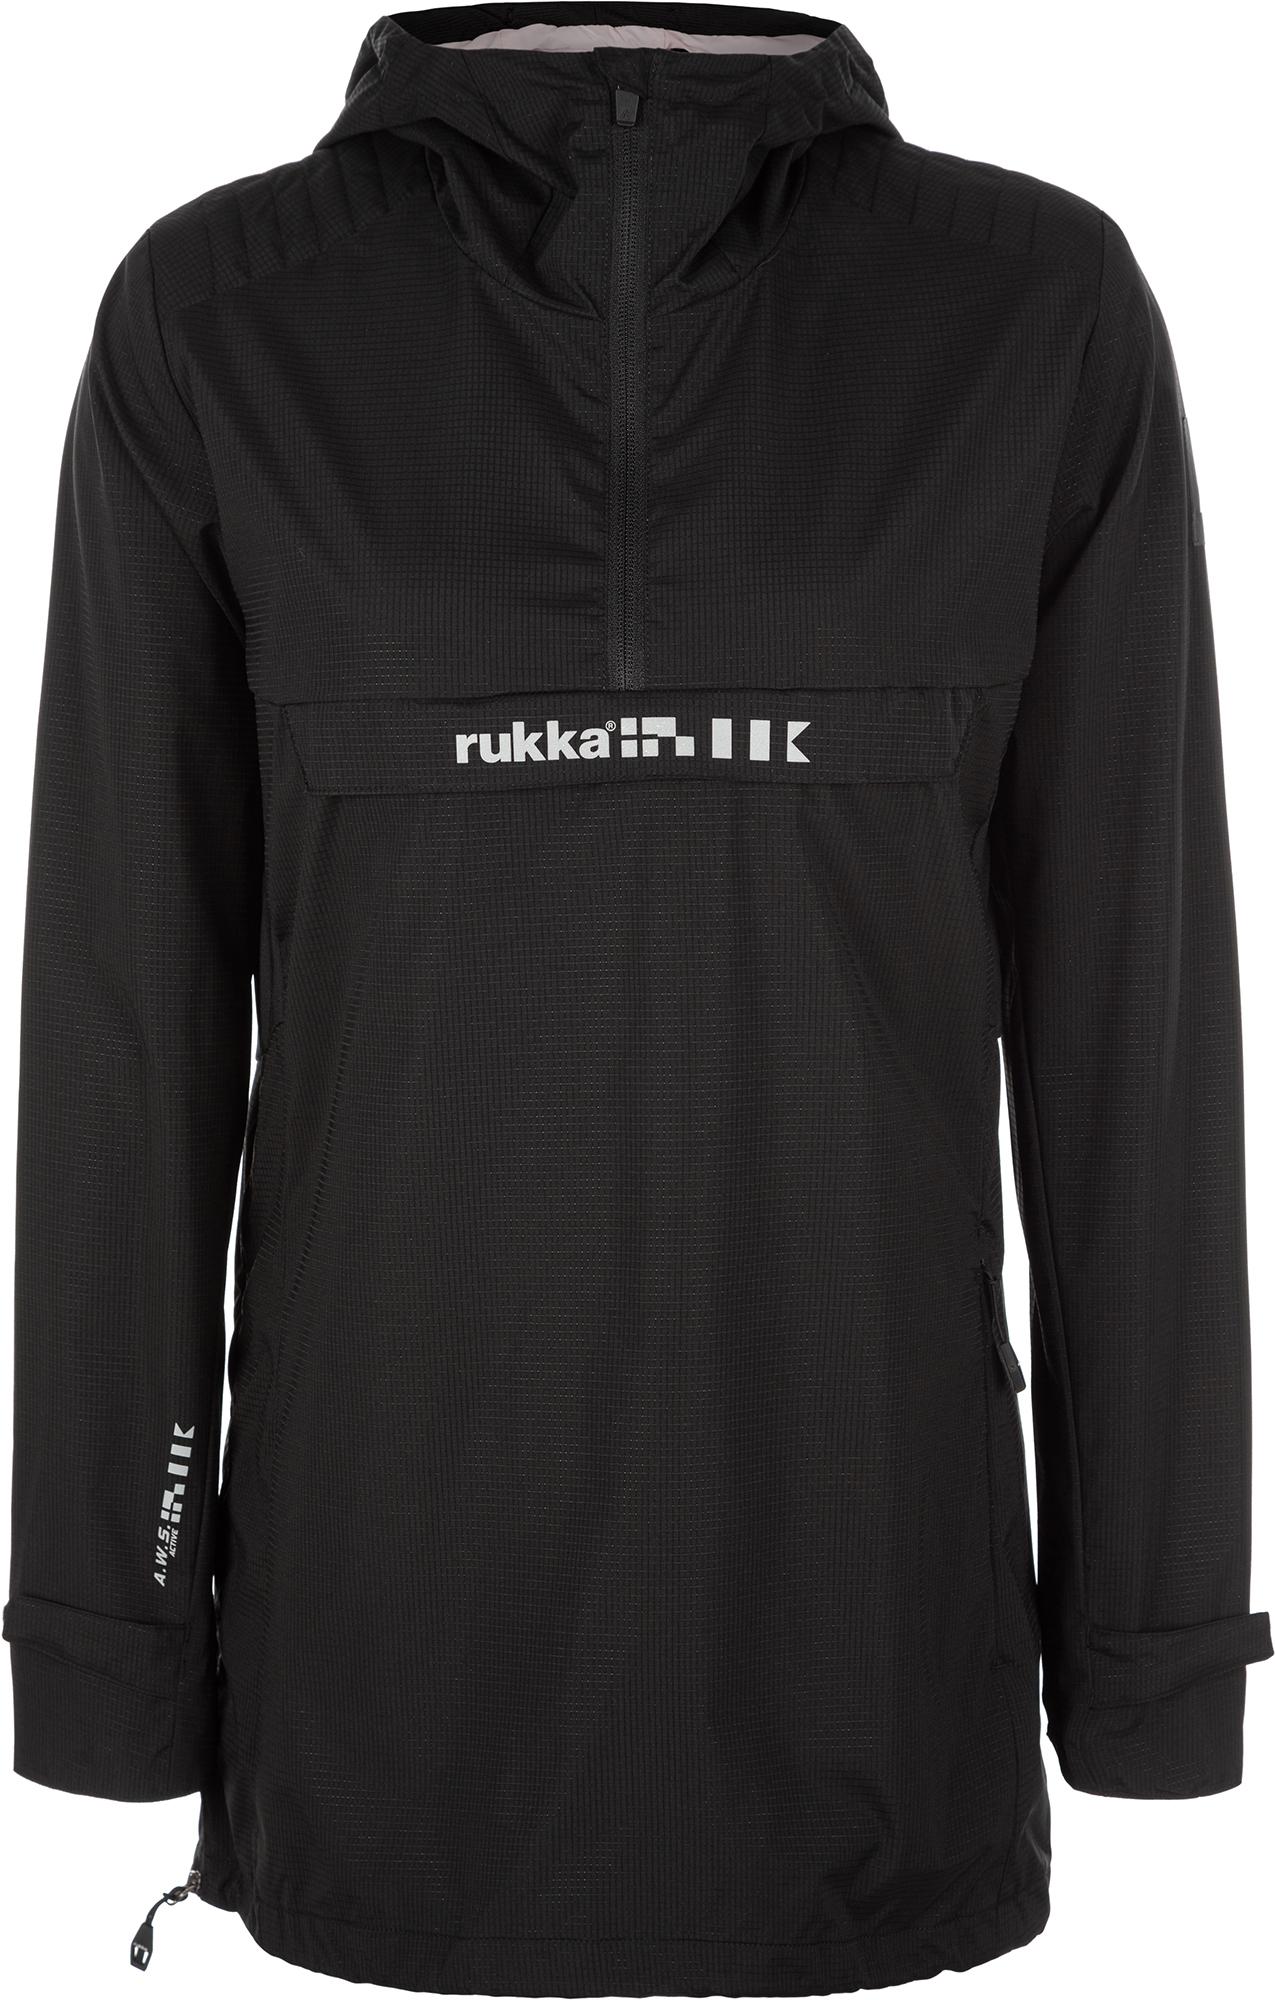 Rukka Куртка женская Rukka Tuhnaja, размер 44